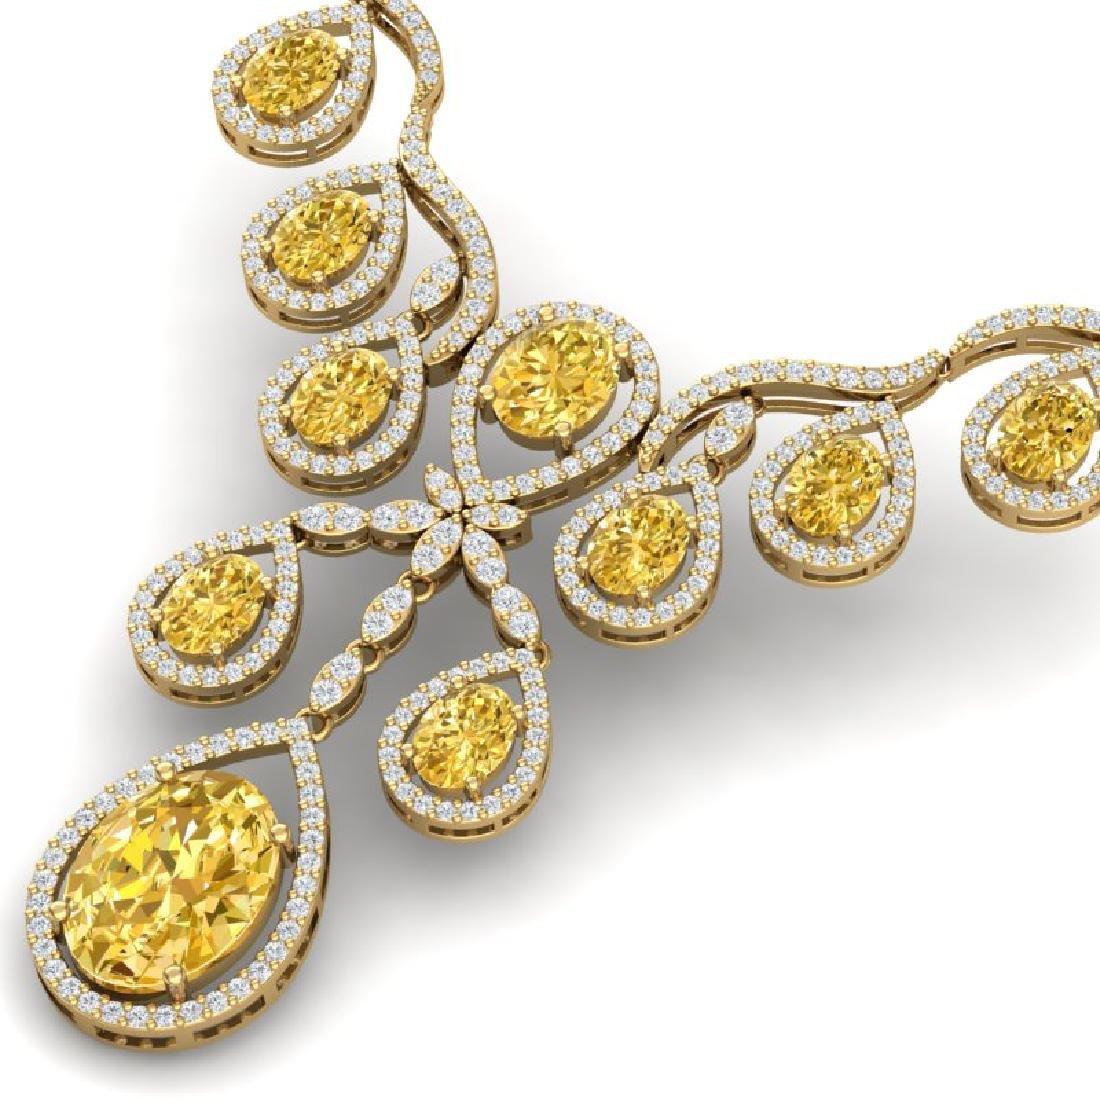 36.51 CTW Royalty Canary Citrine & VS Diamond Necklace - 2